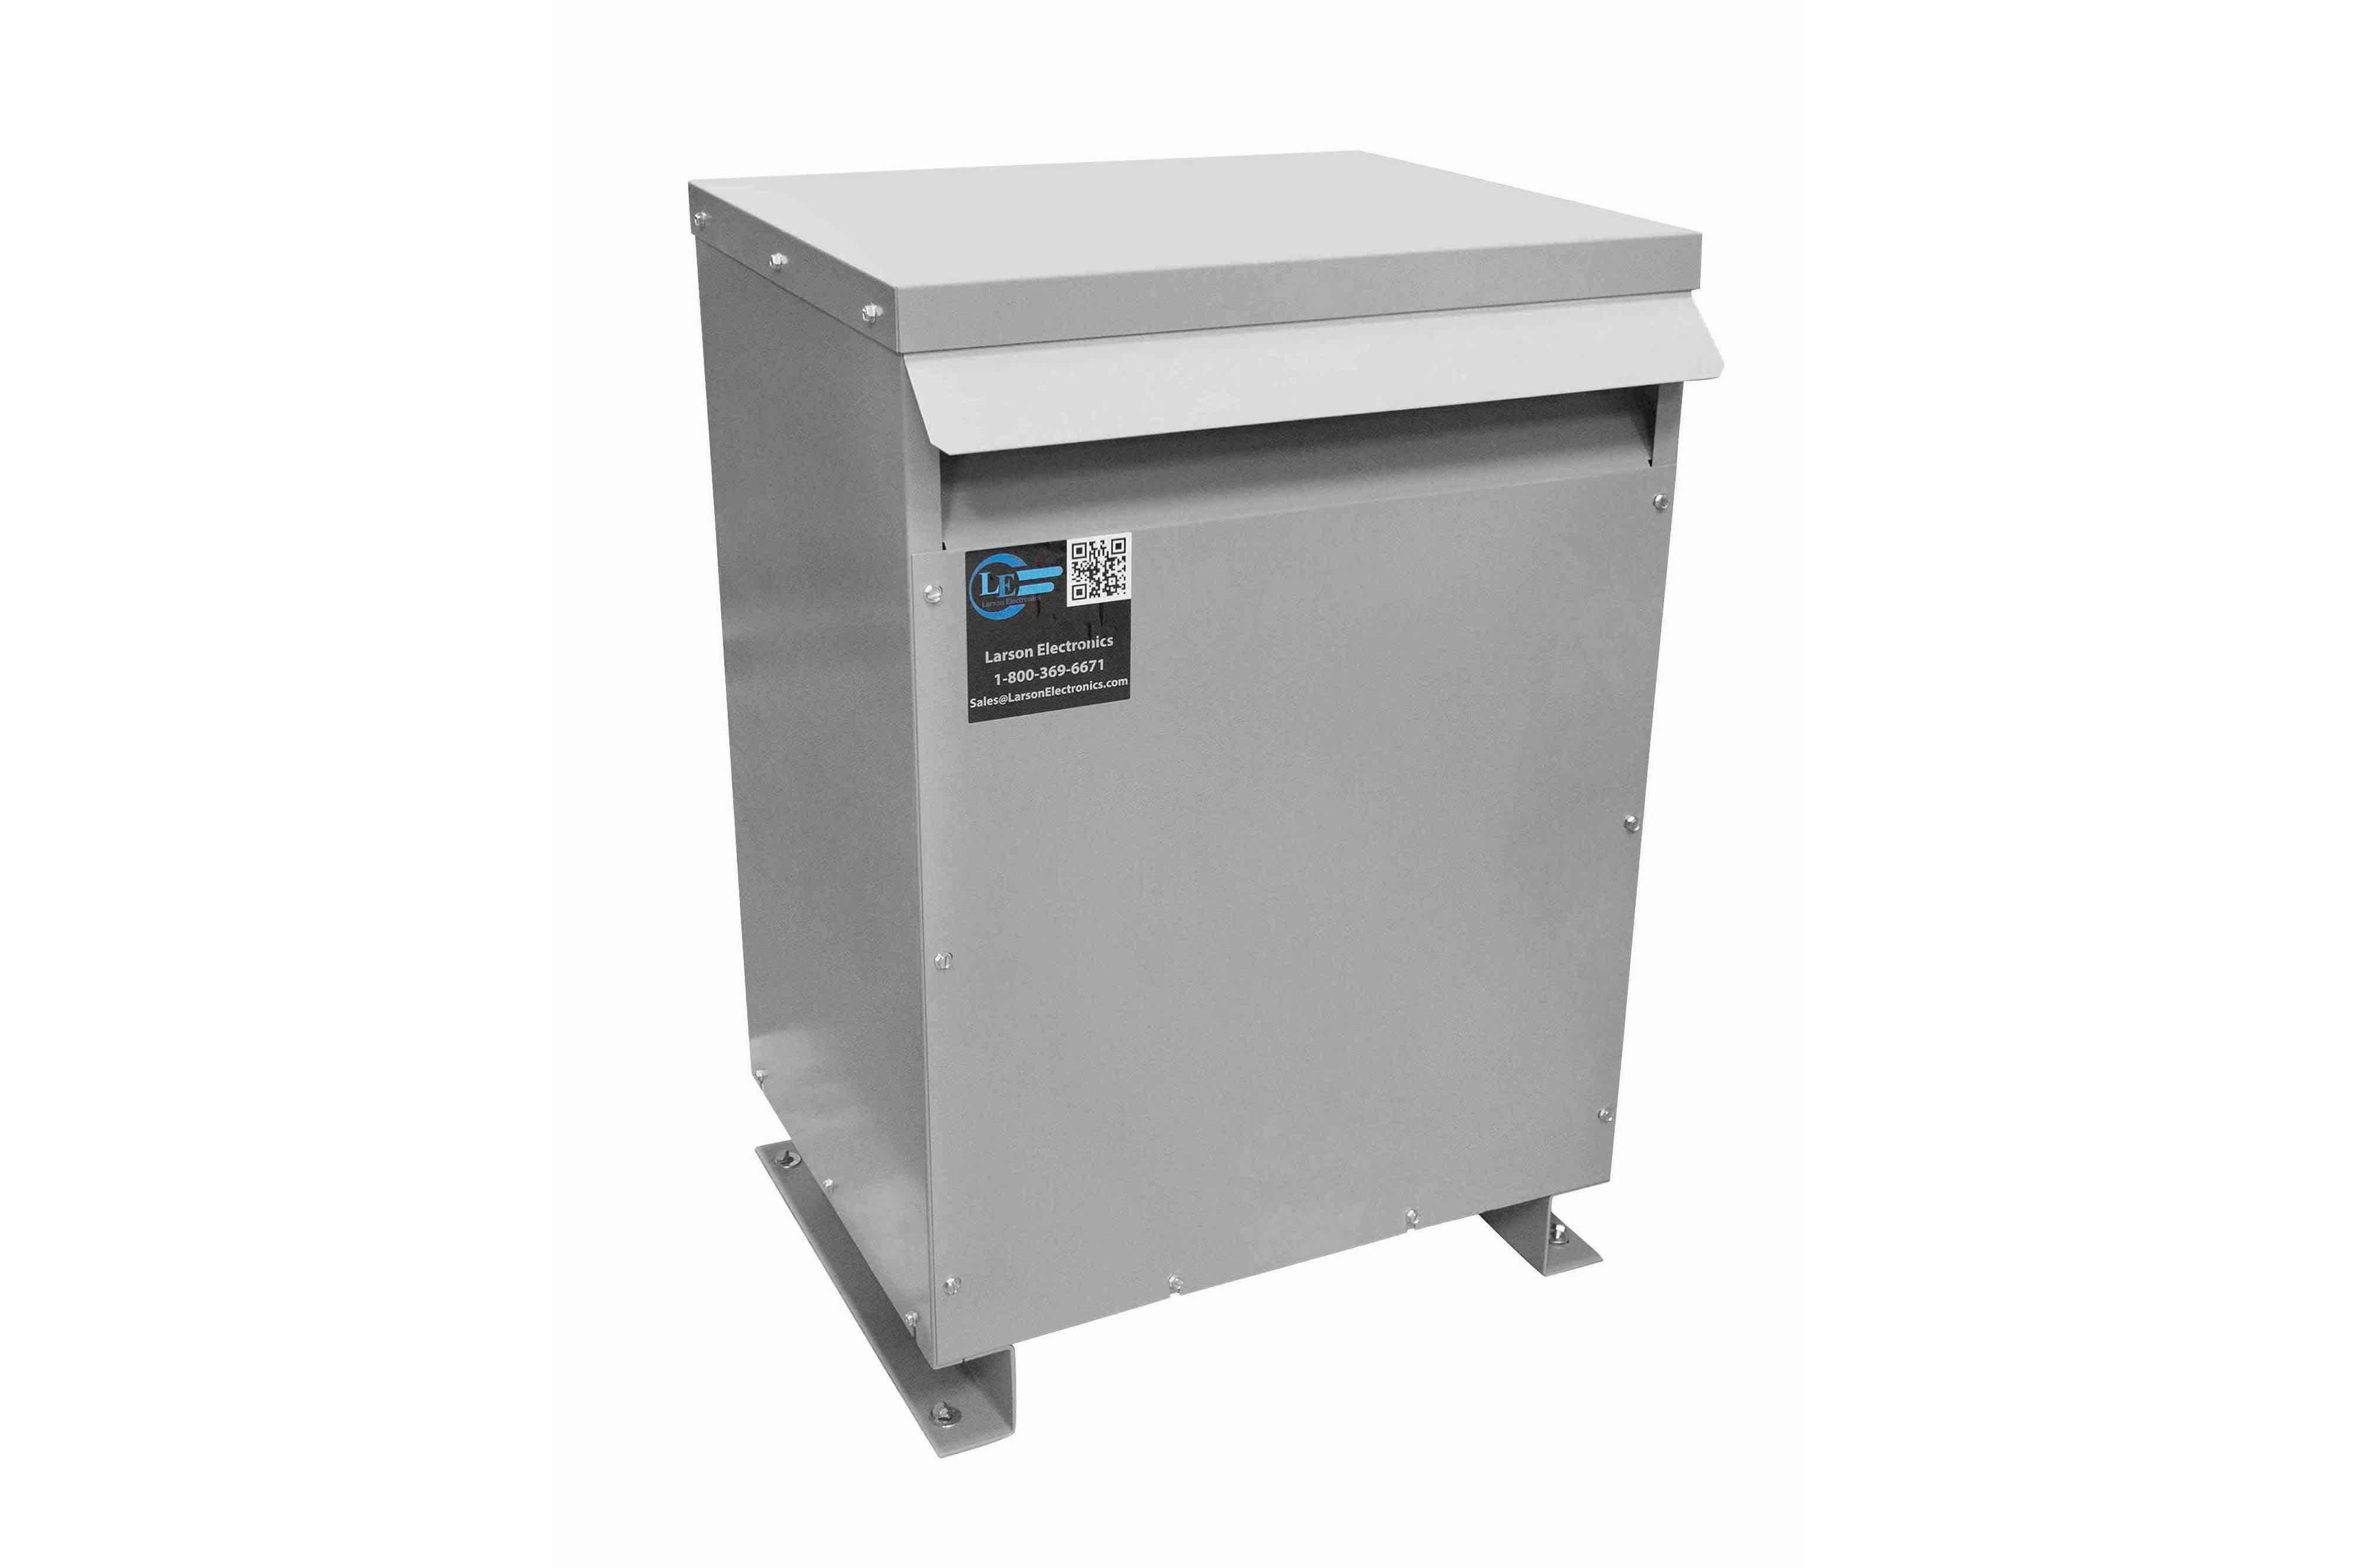 500 kVA 3PH Isolation Transformer, 220V Wye Primary, 208V Delta Secondary, N3R, Ventilated, 60 Hz